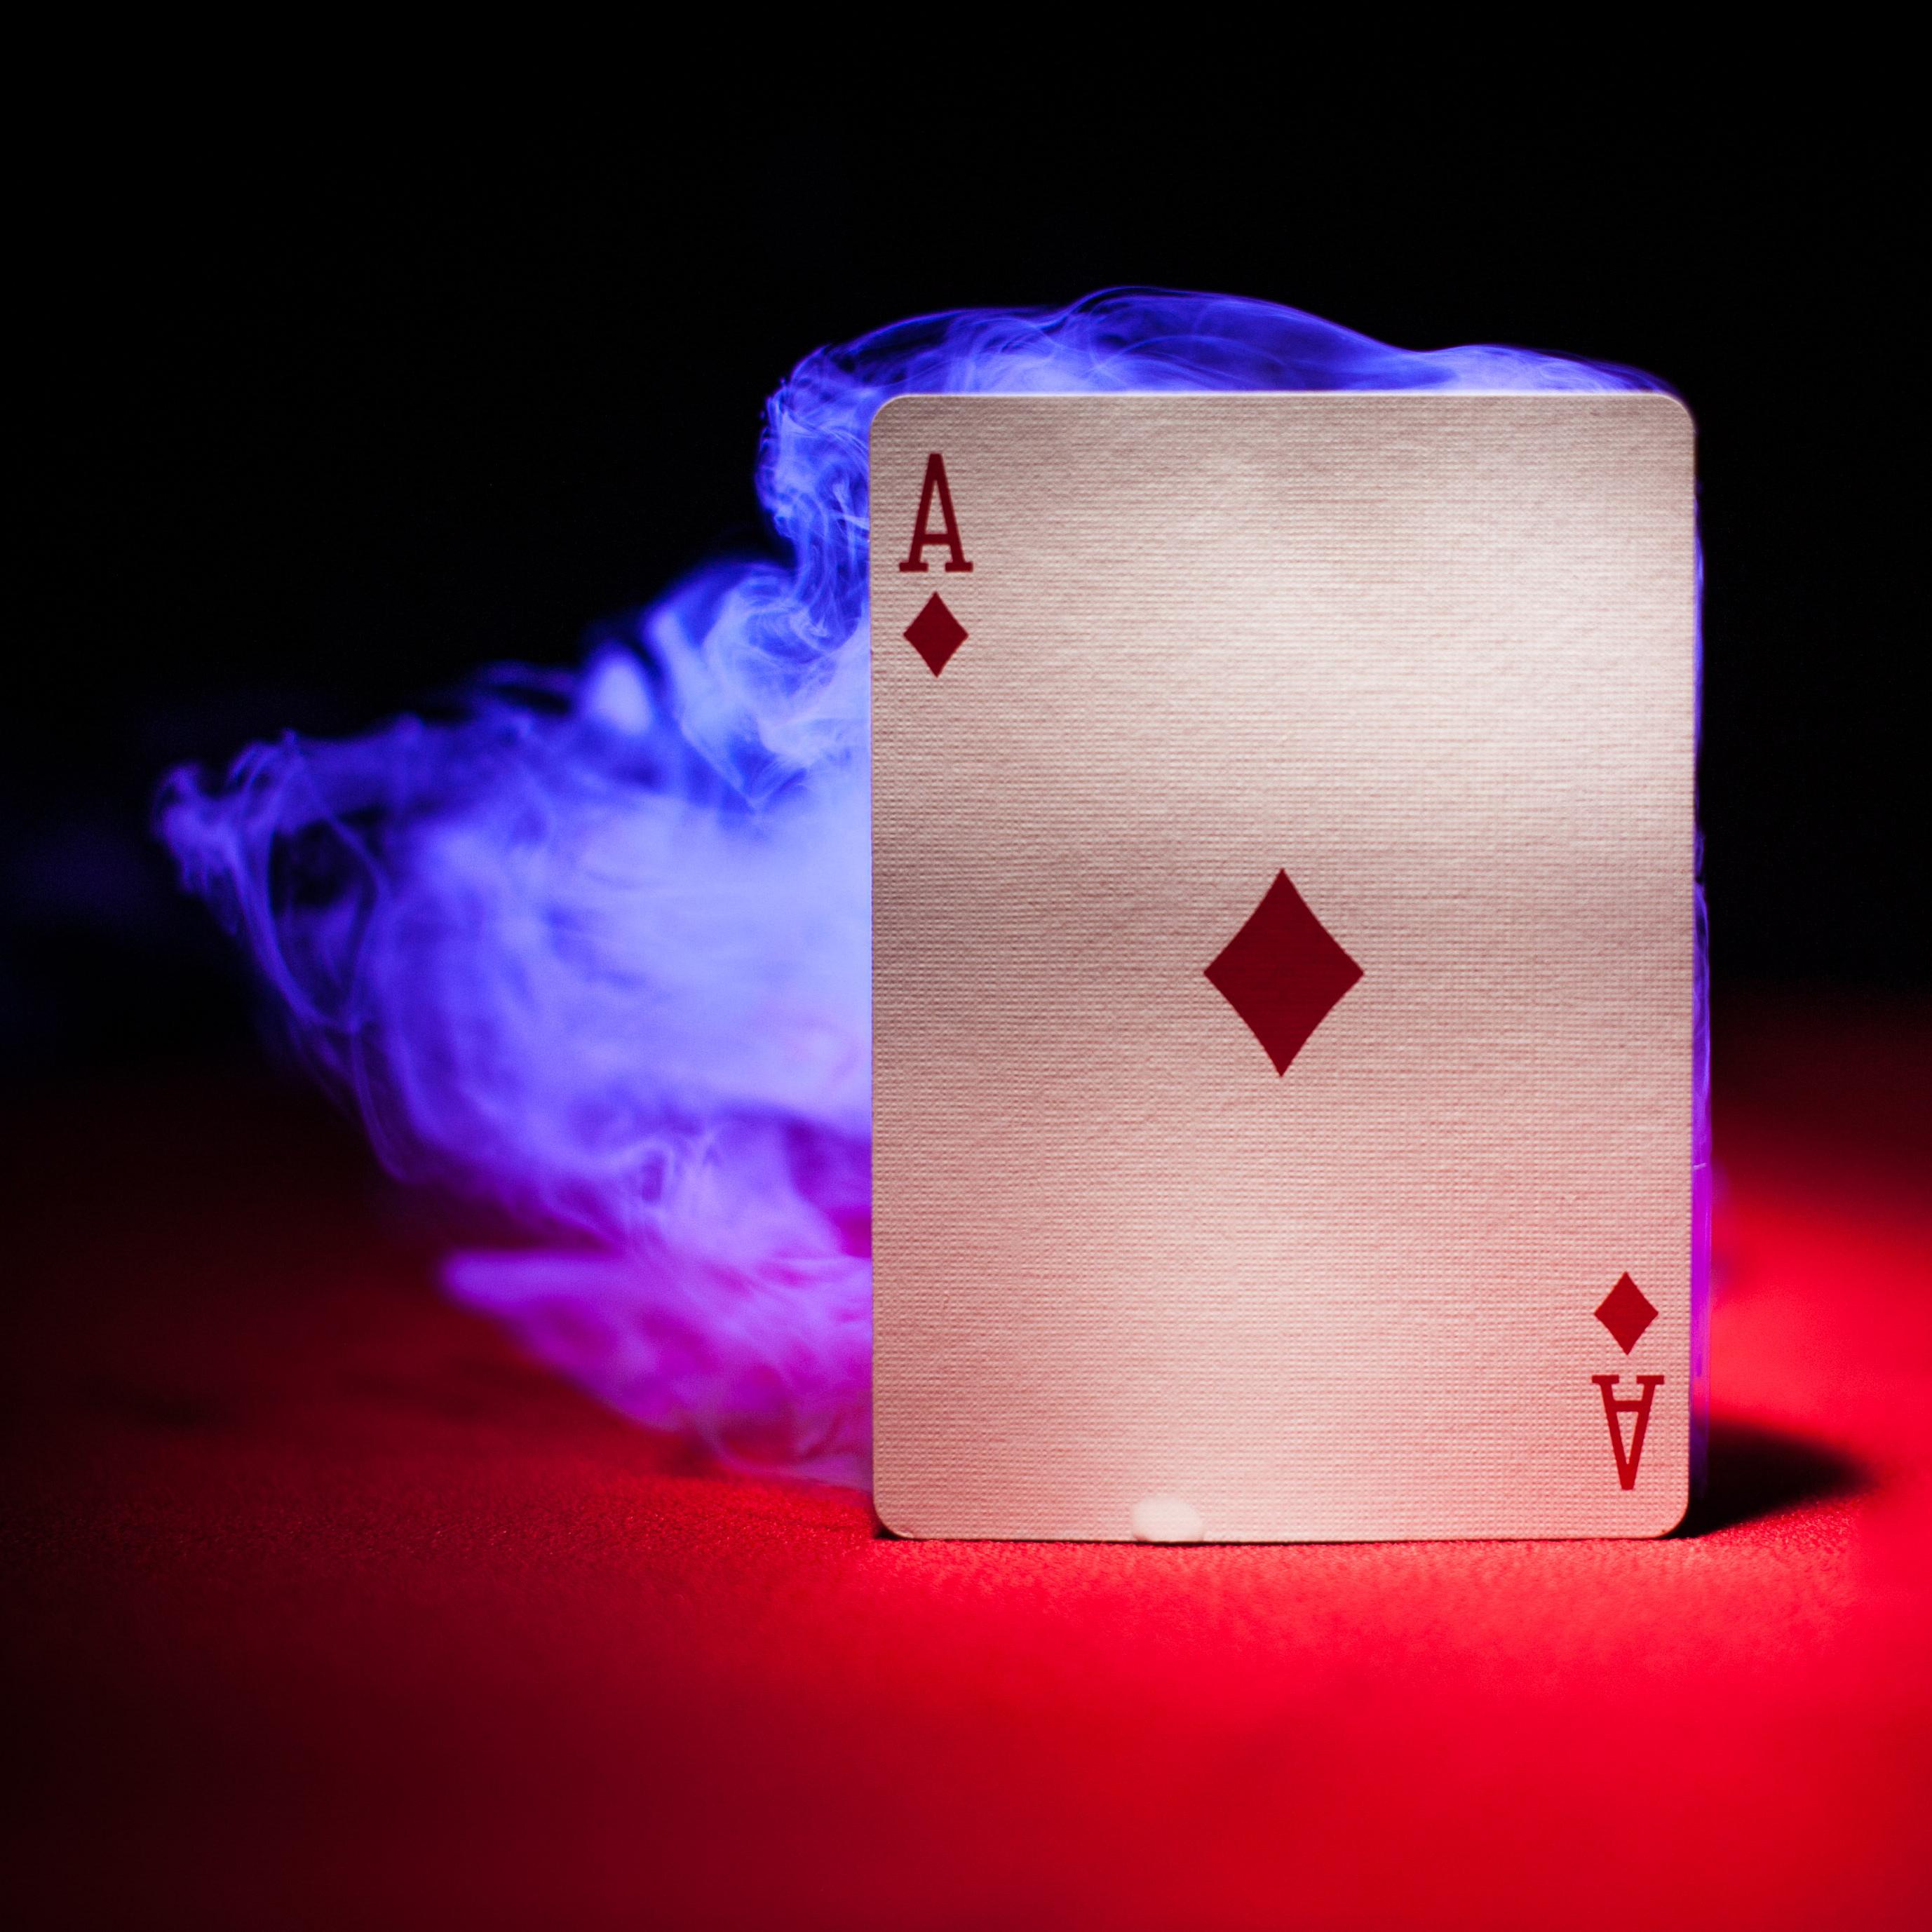 mysticpixel_cardsmoke_ace_diamonds